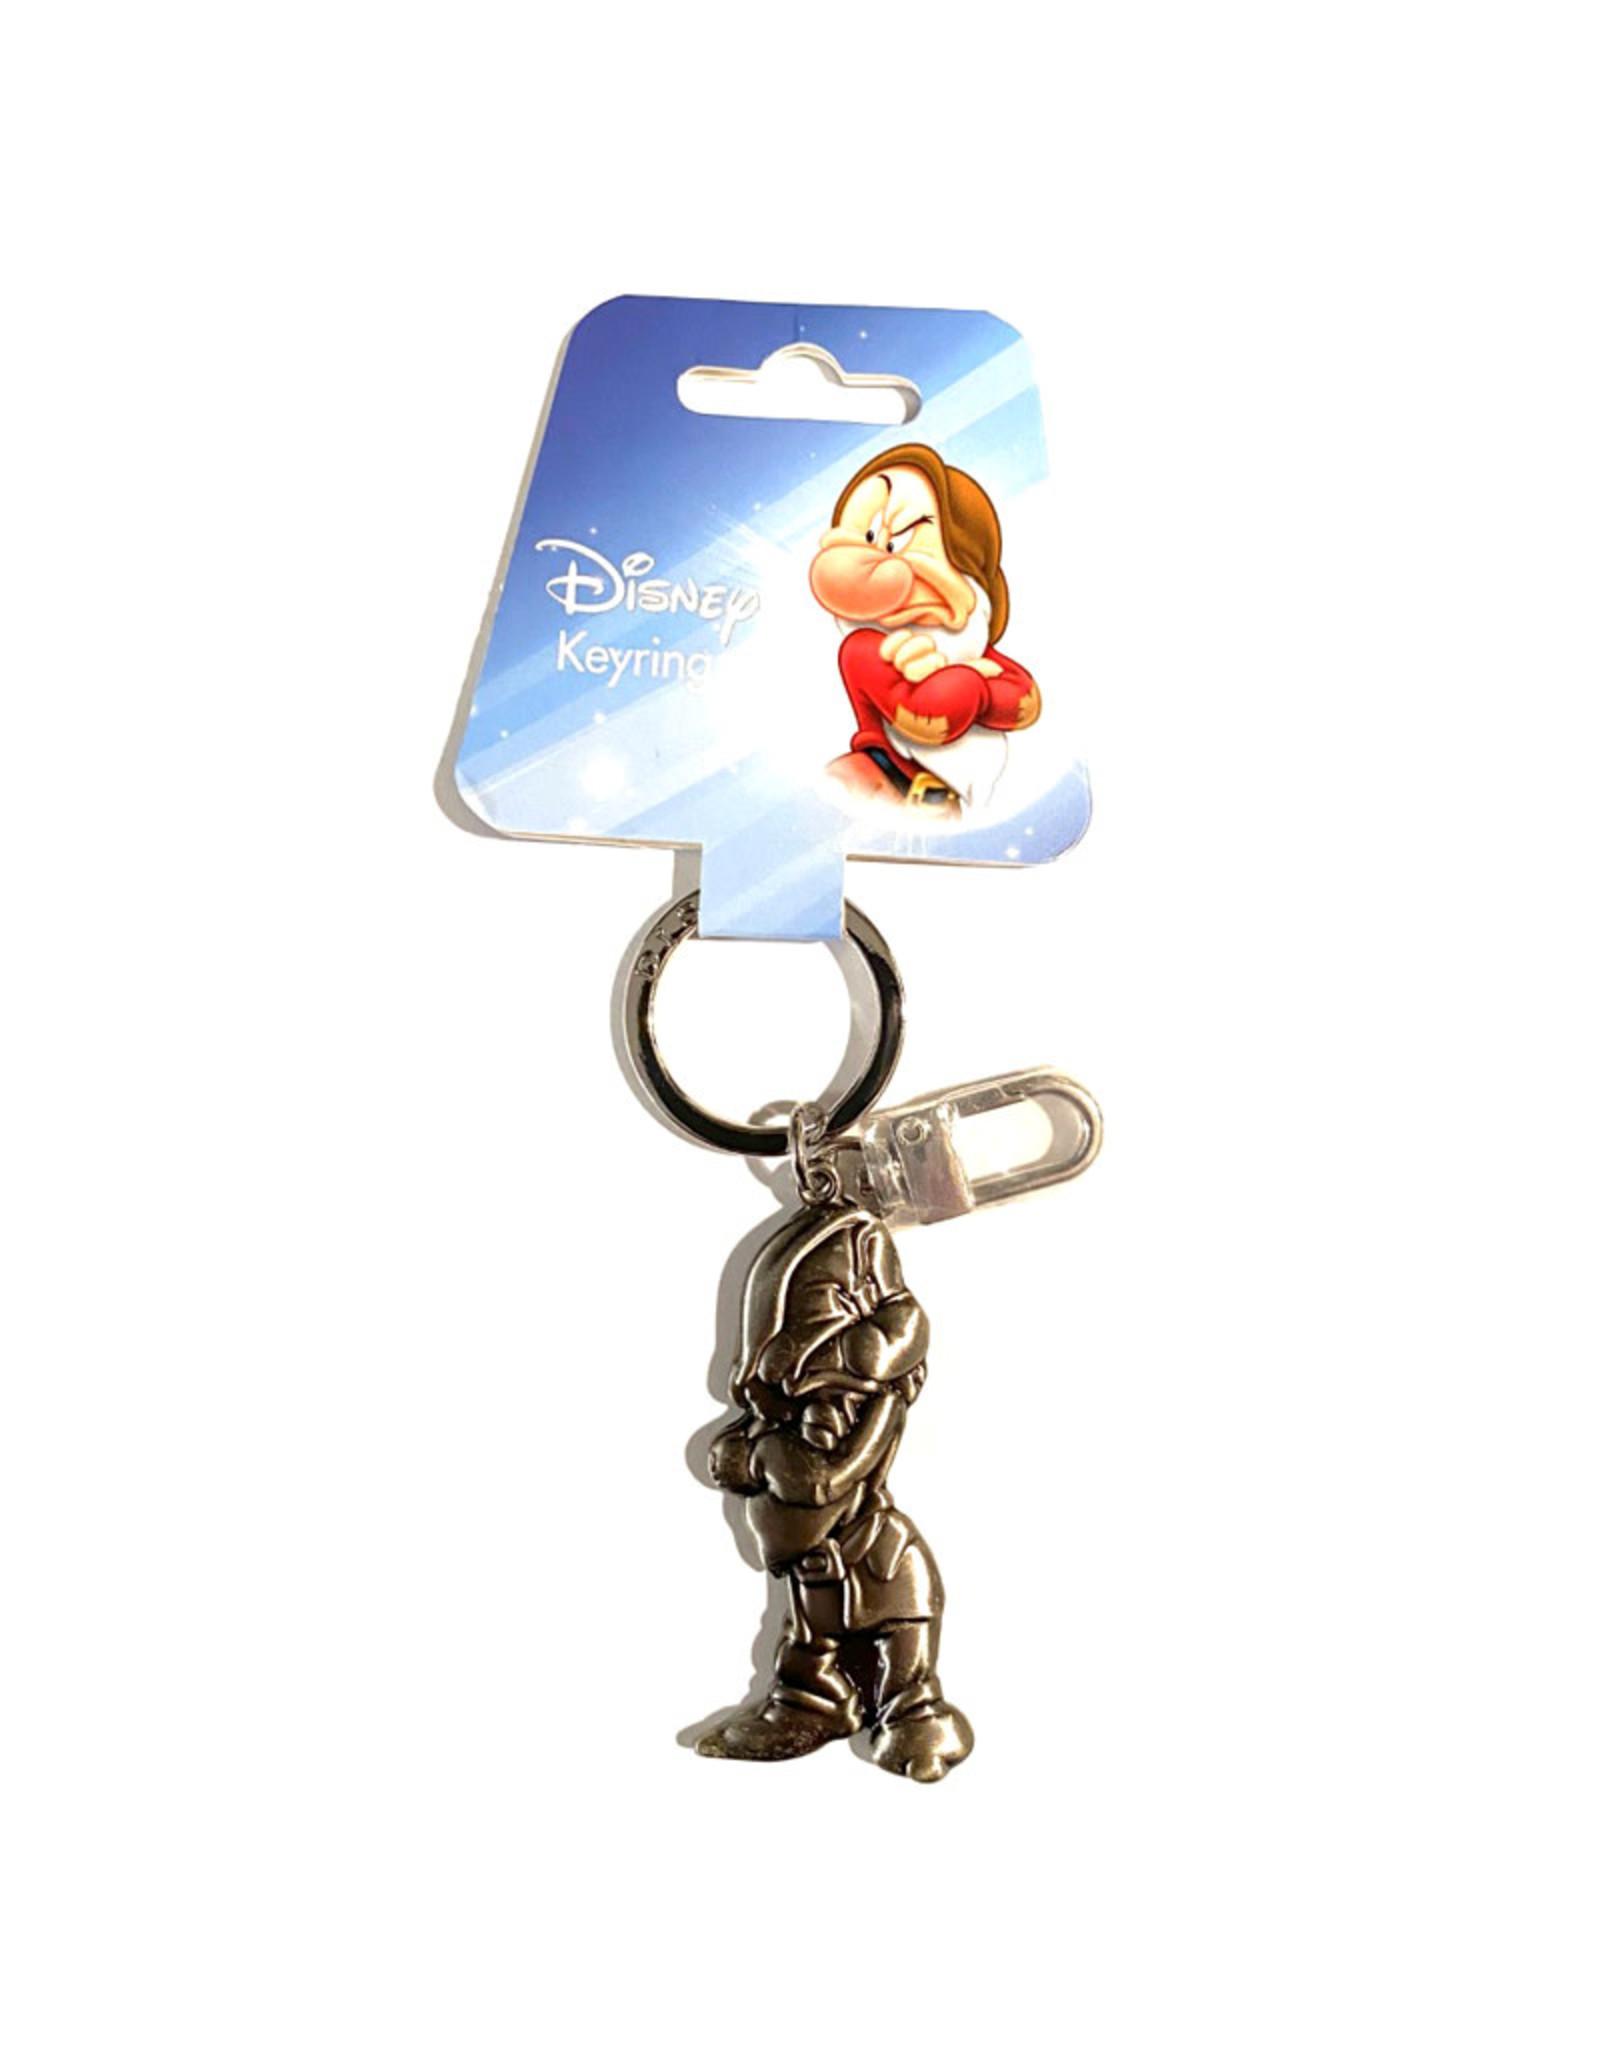 Disney Disney ( Keychain ) Grumpy